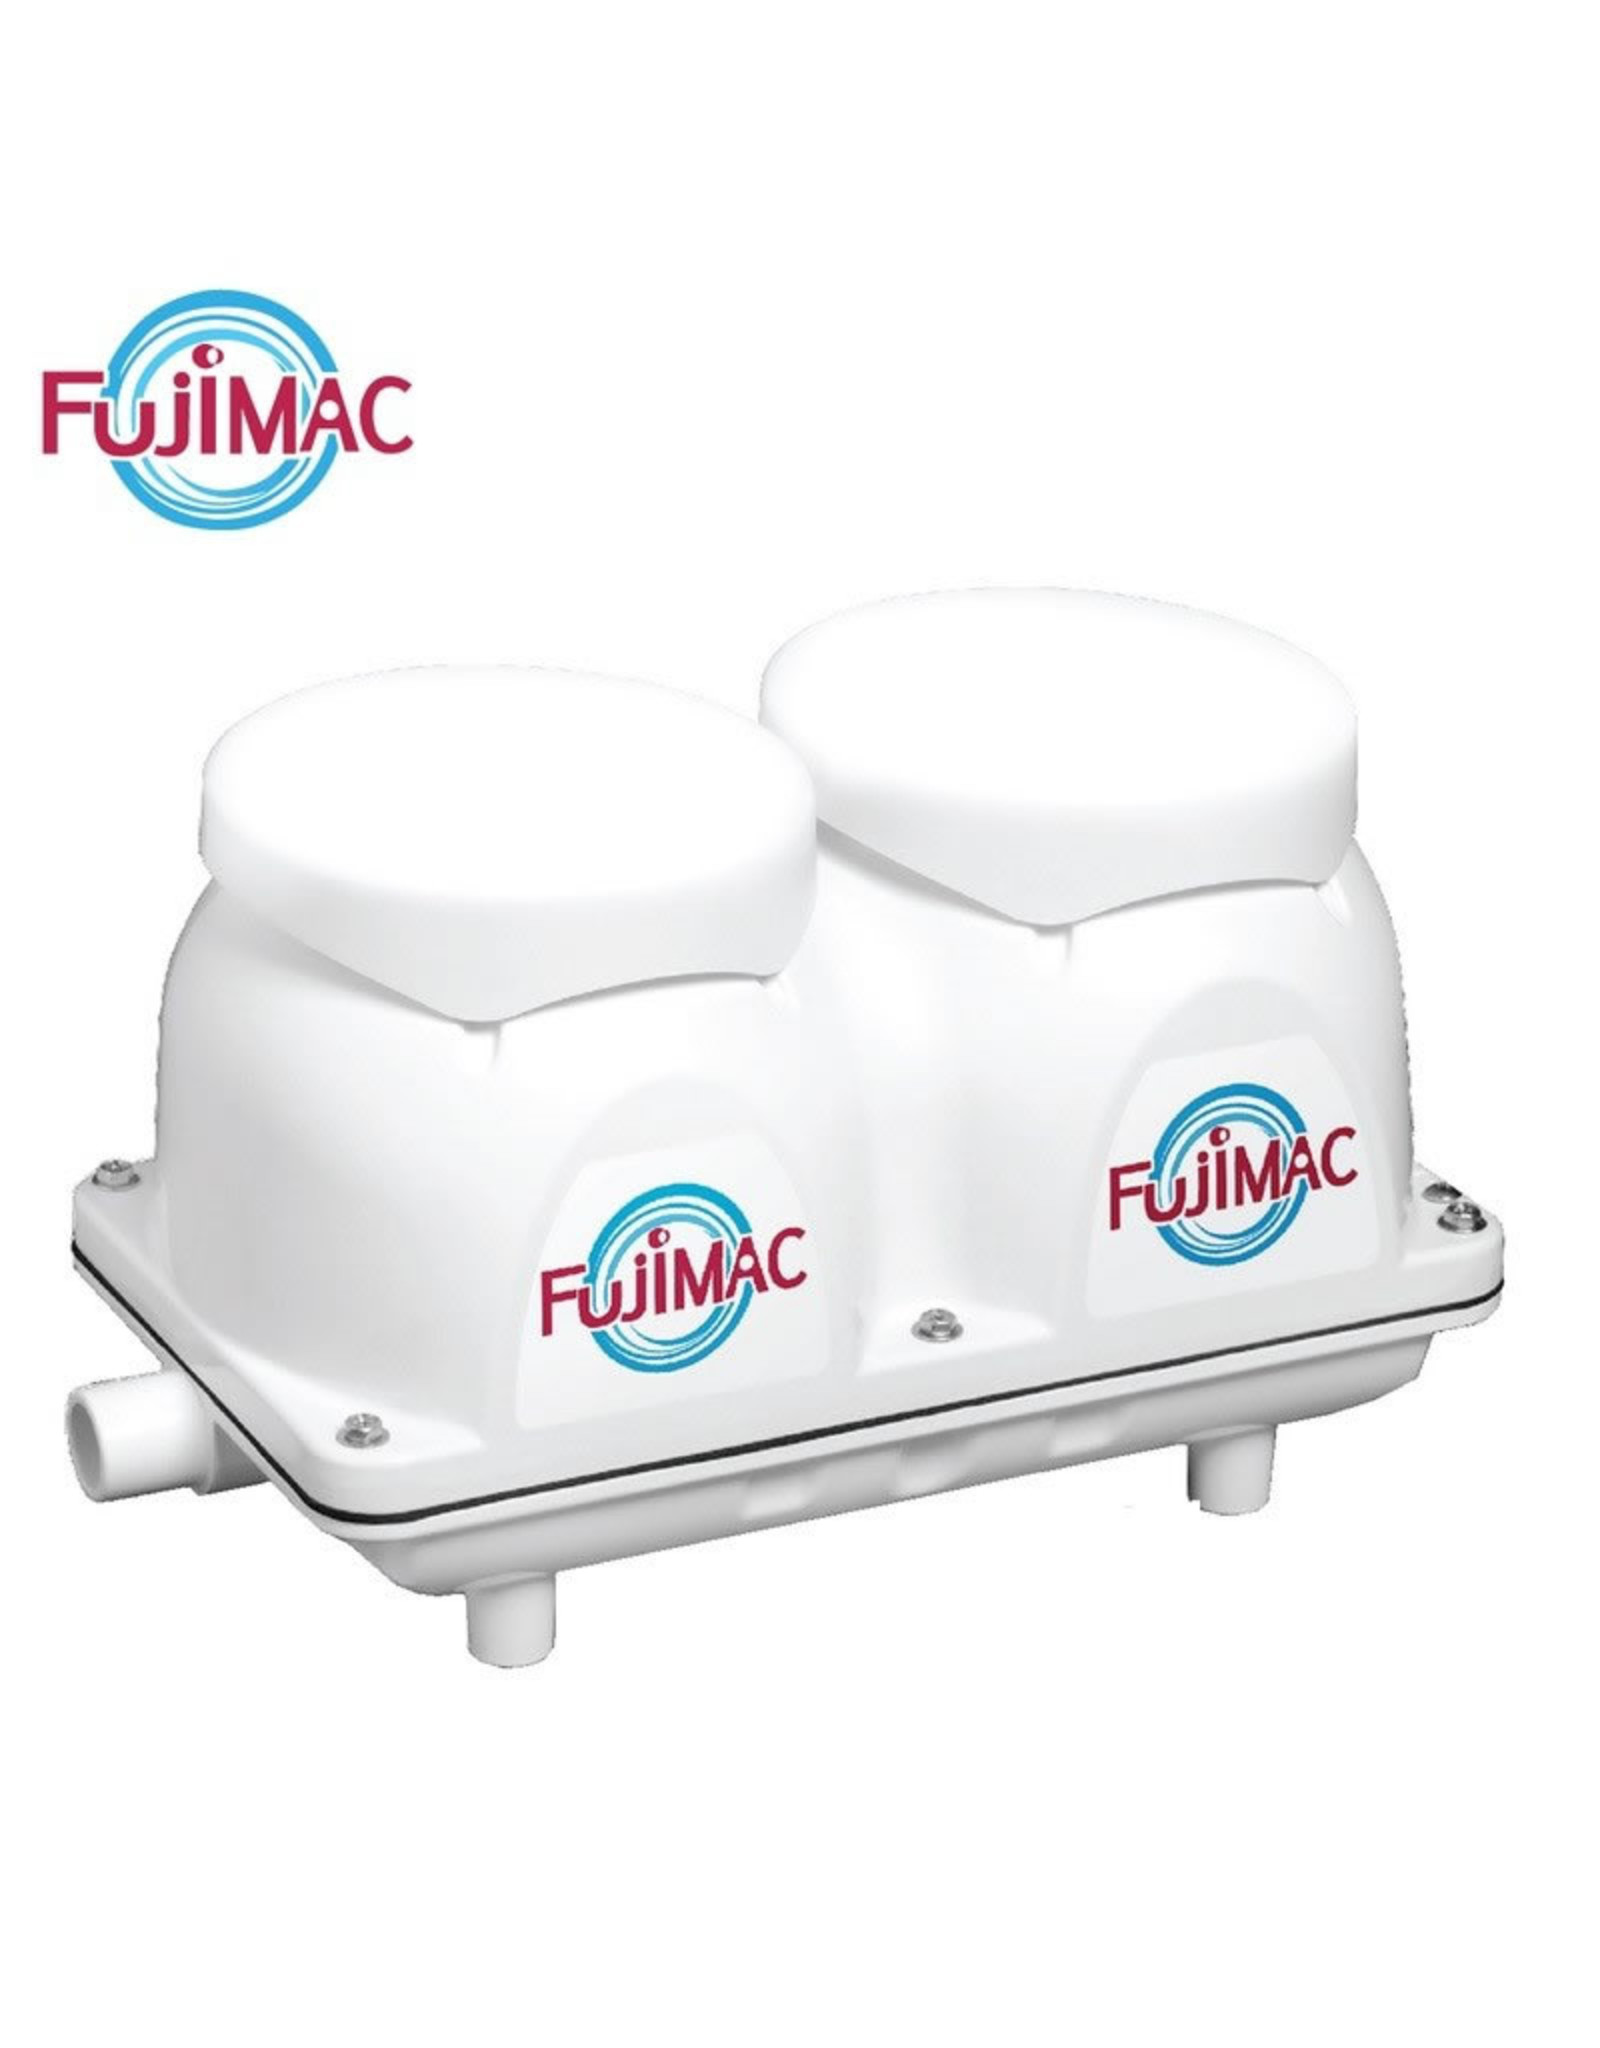 Fujimac Fujimac Eco Luftpumpe